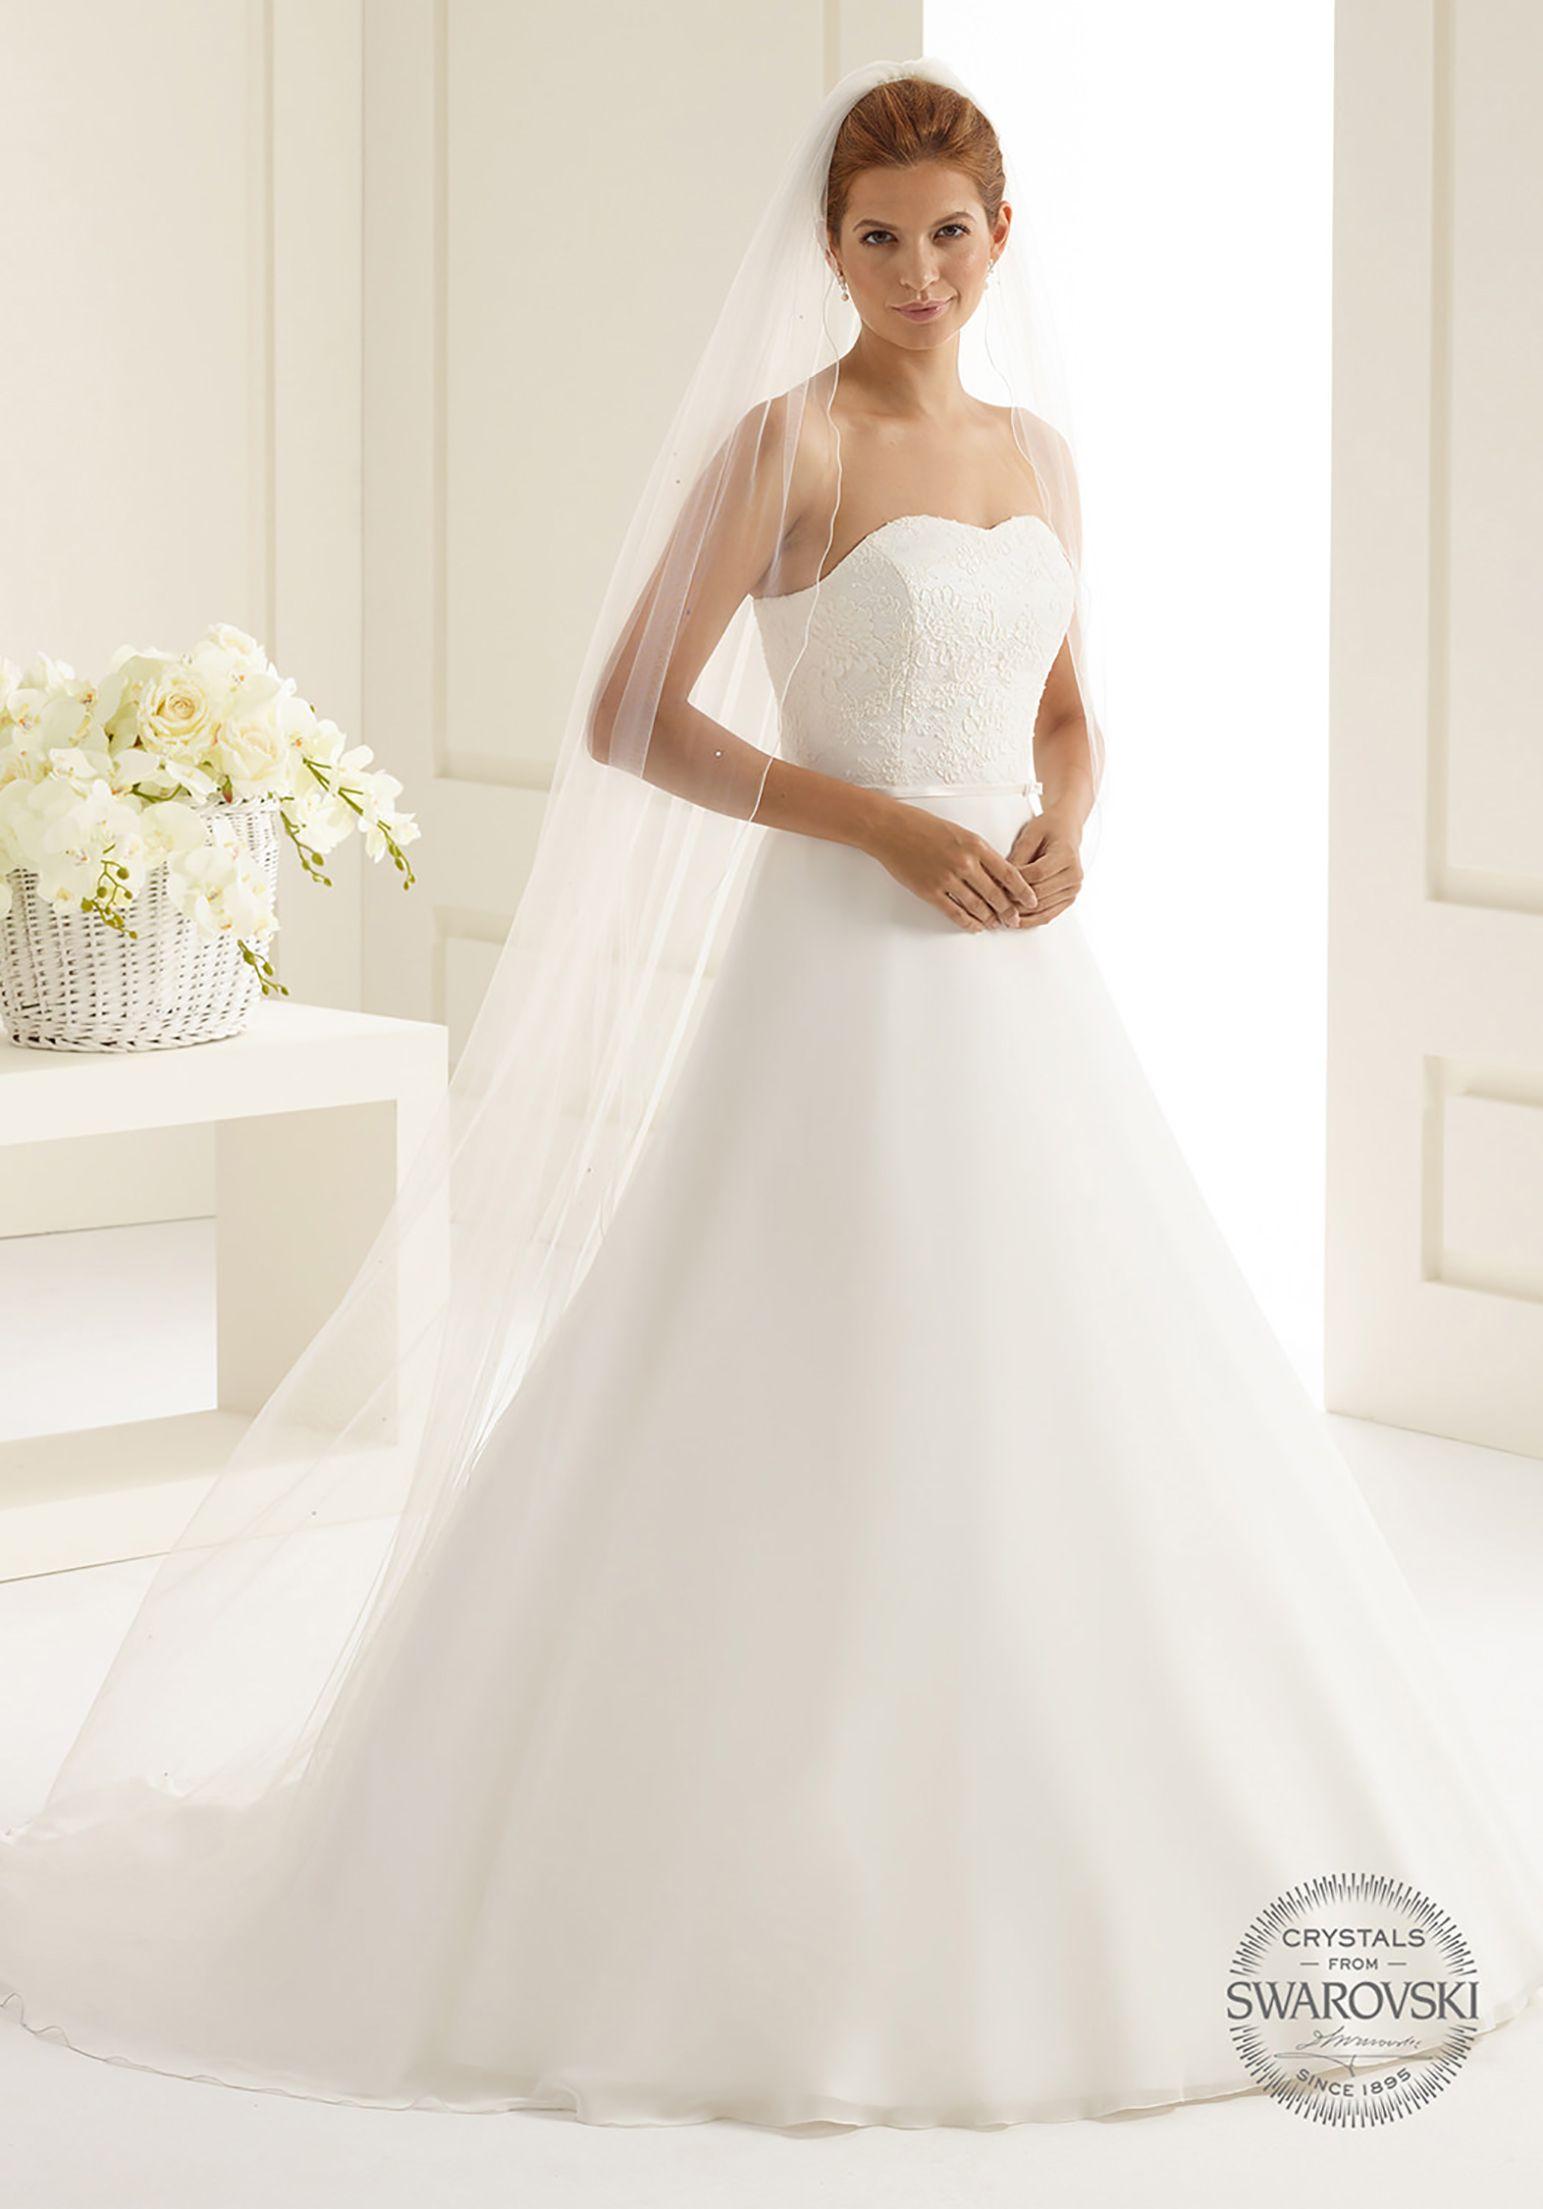 9719176d8e Delicate veil S222 from Bianco Evento  biancoevento  veil  swarovski   weddingdress  weddingideas